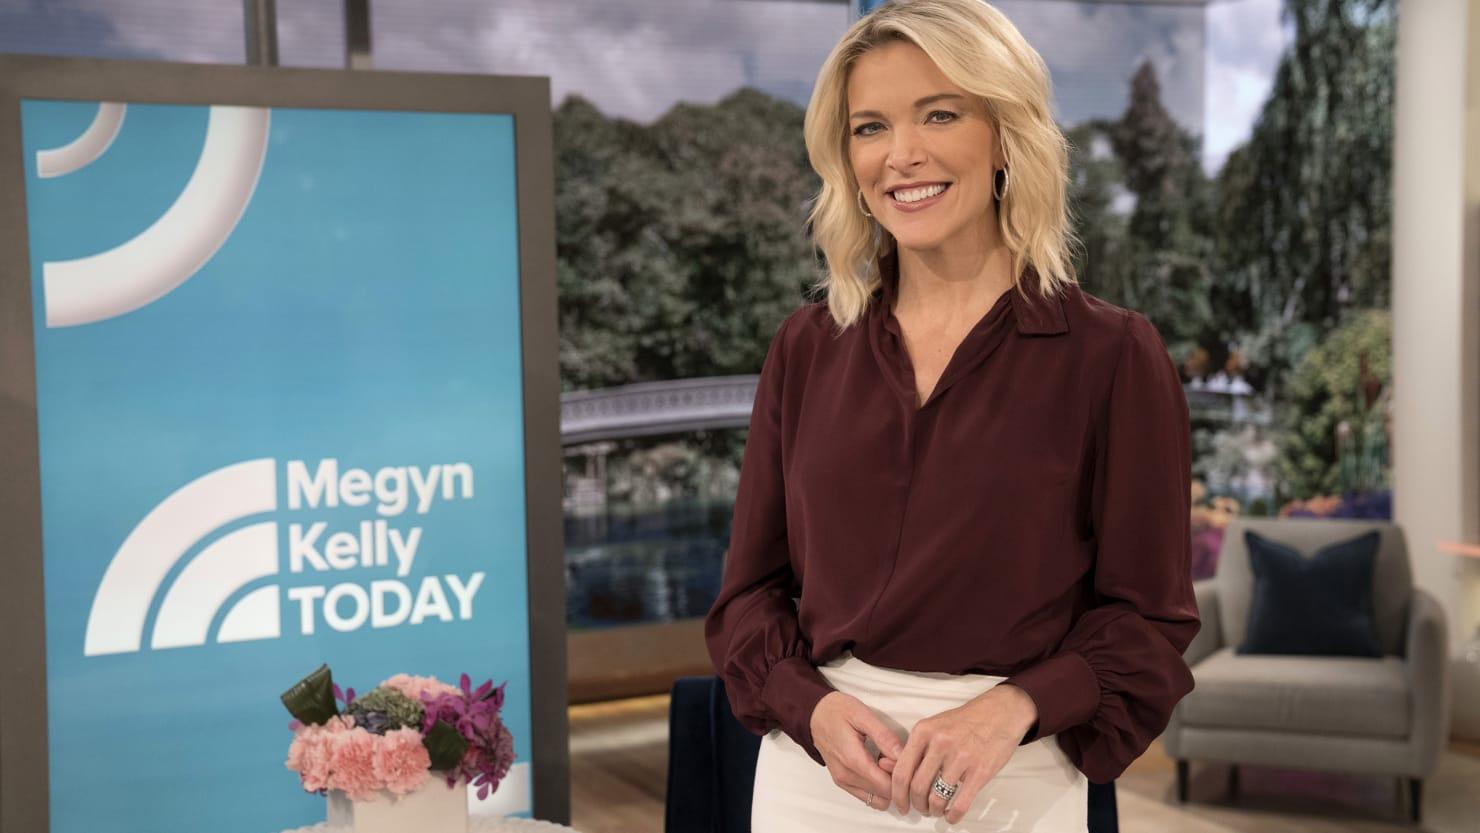 Megyn Kelly, Today Show